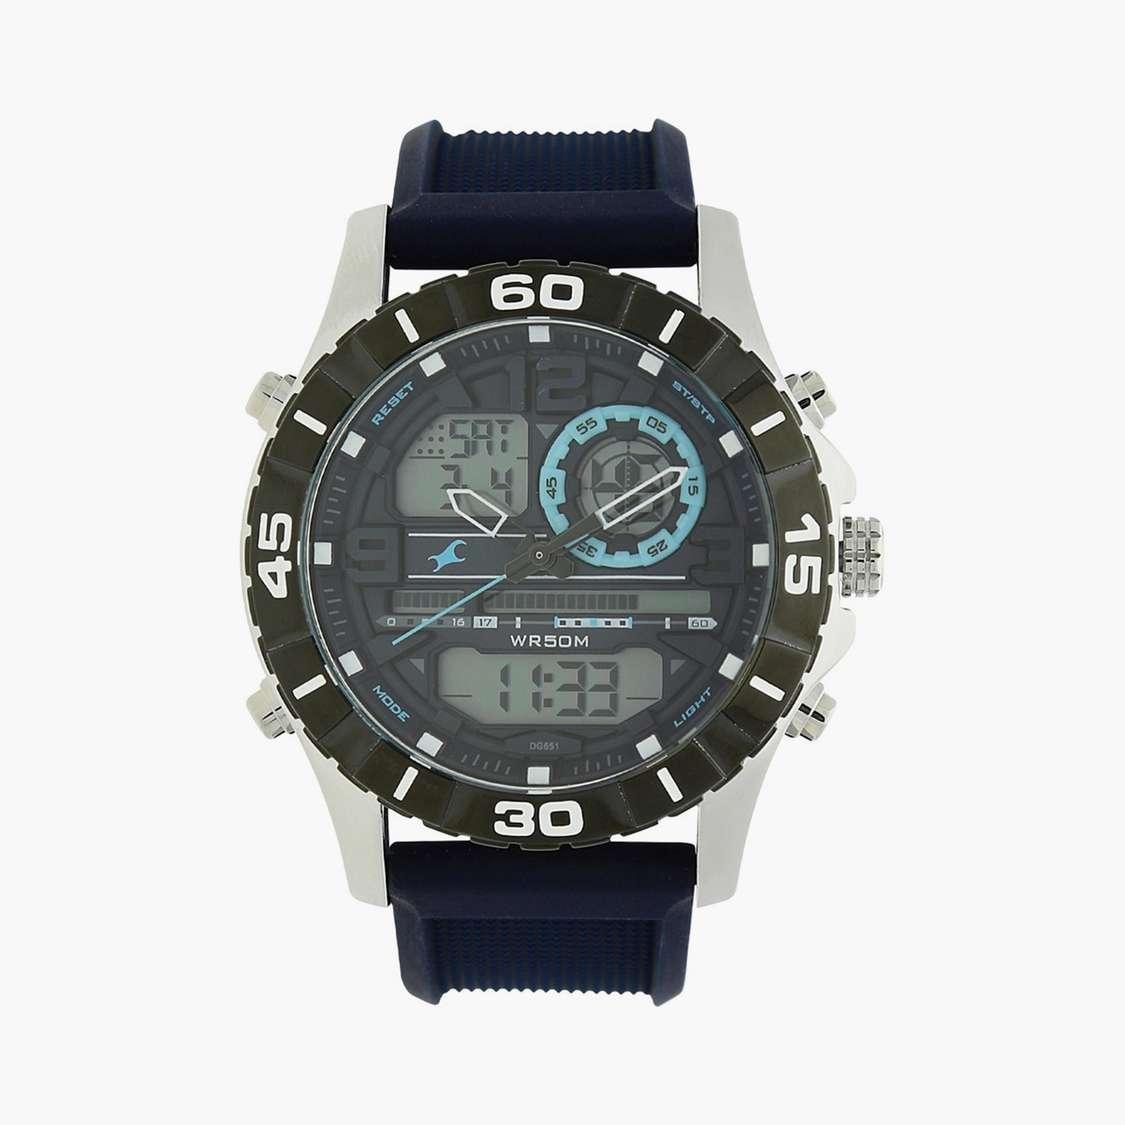 FASTRACK Men Analog-Digital Watch - NL38035SL02-